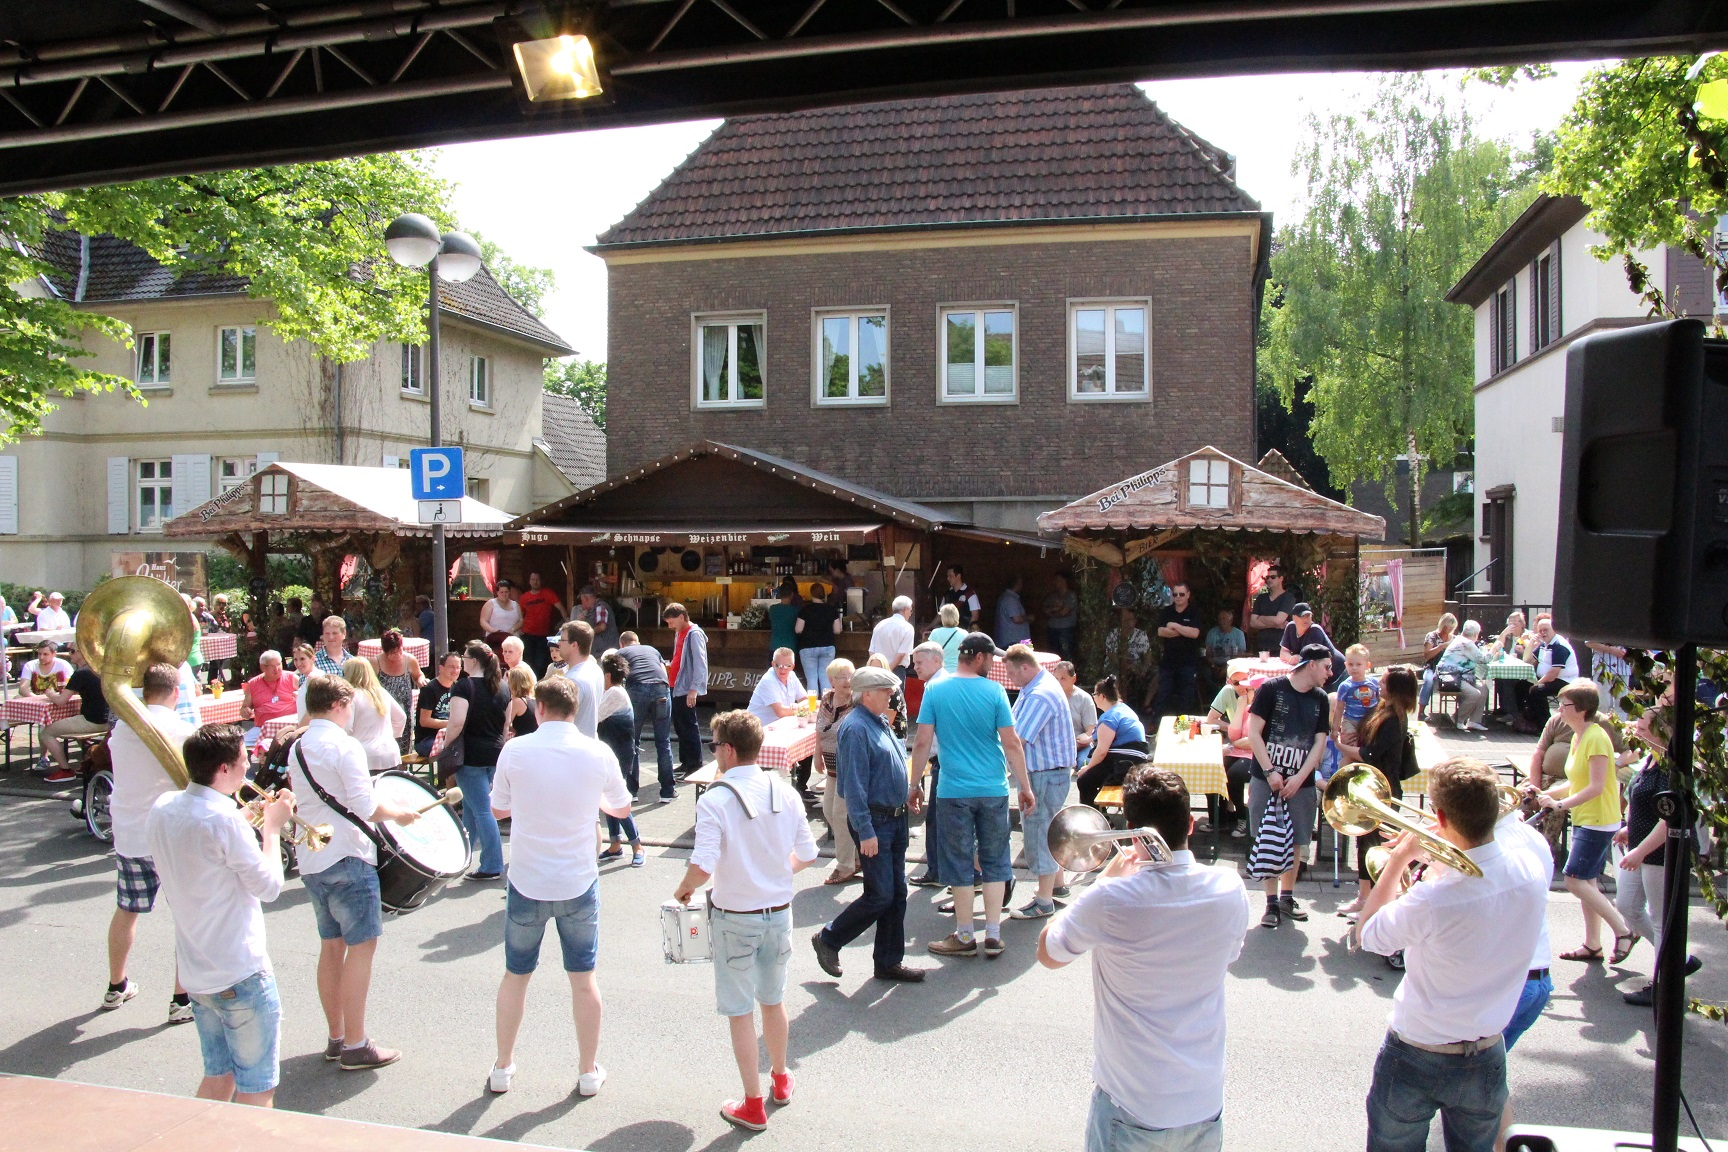 Strassenfest-Brassert-004.jpg